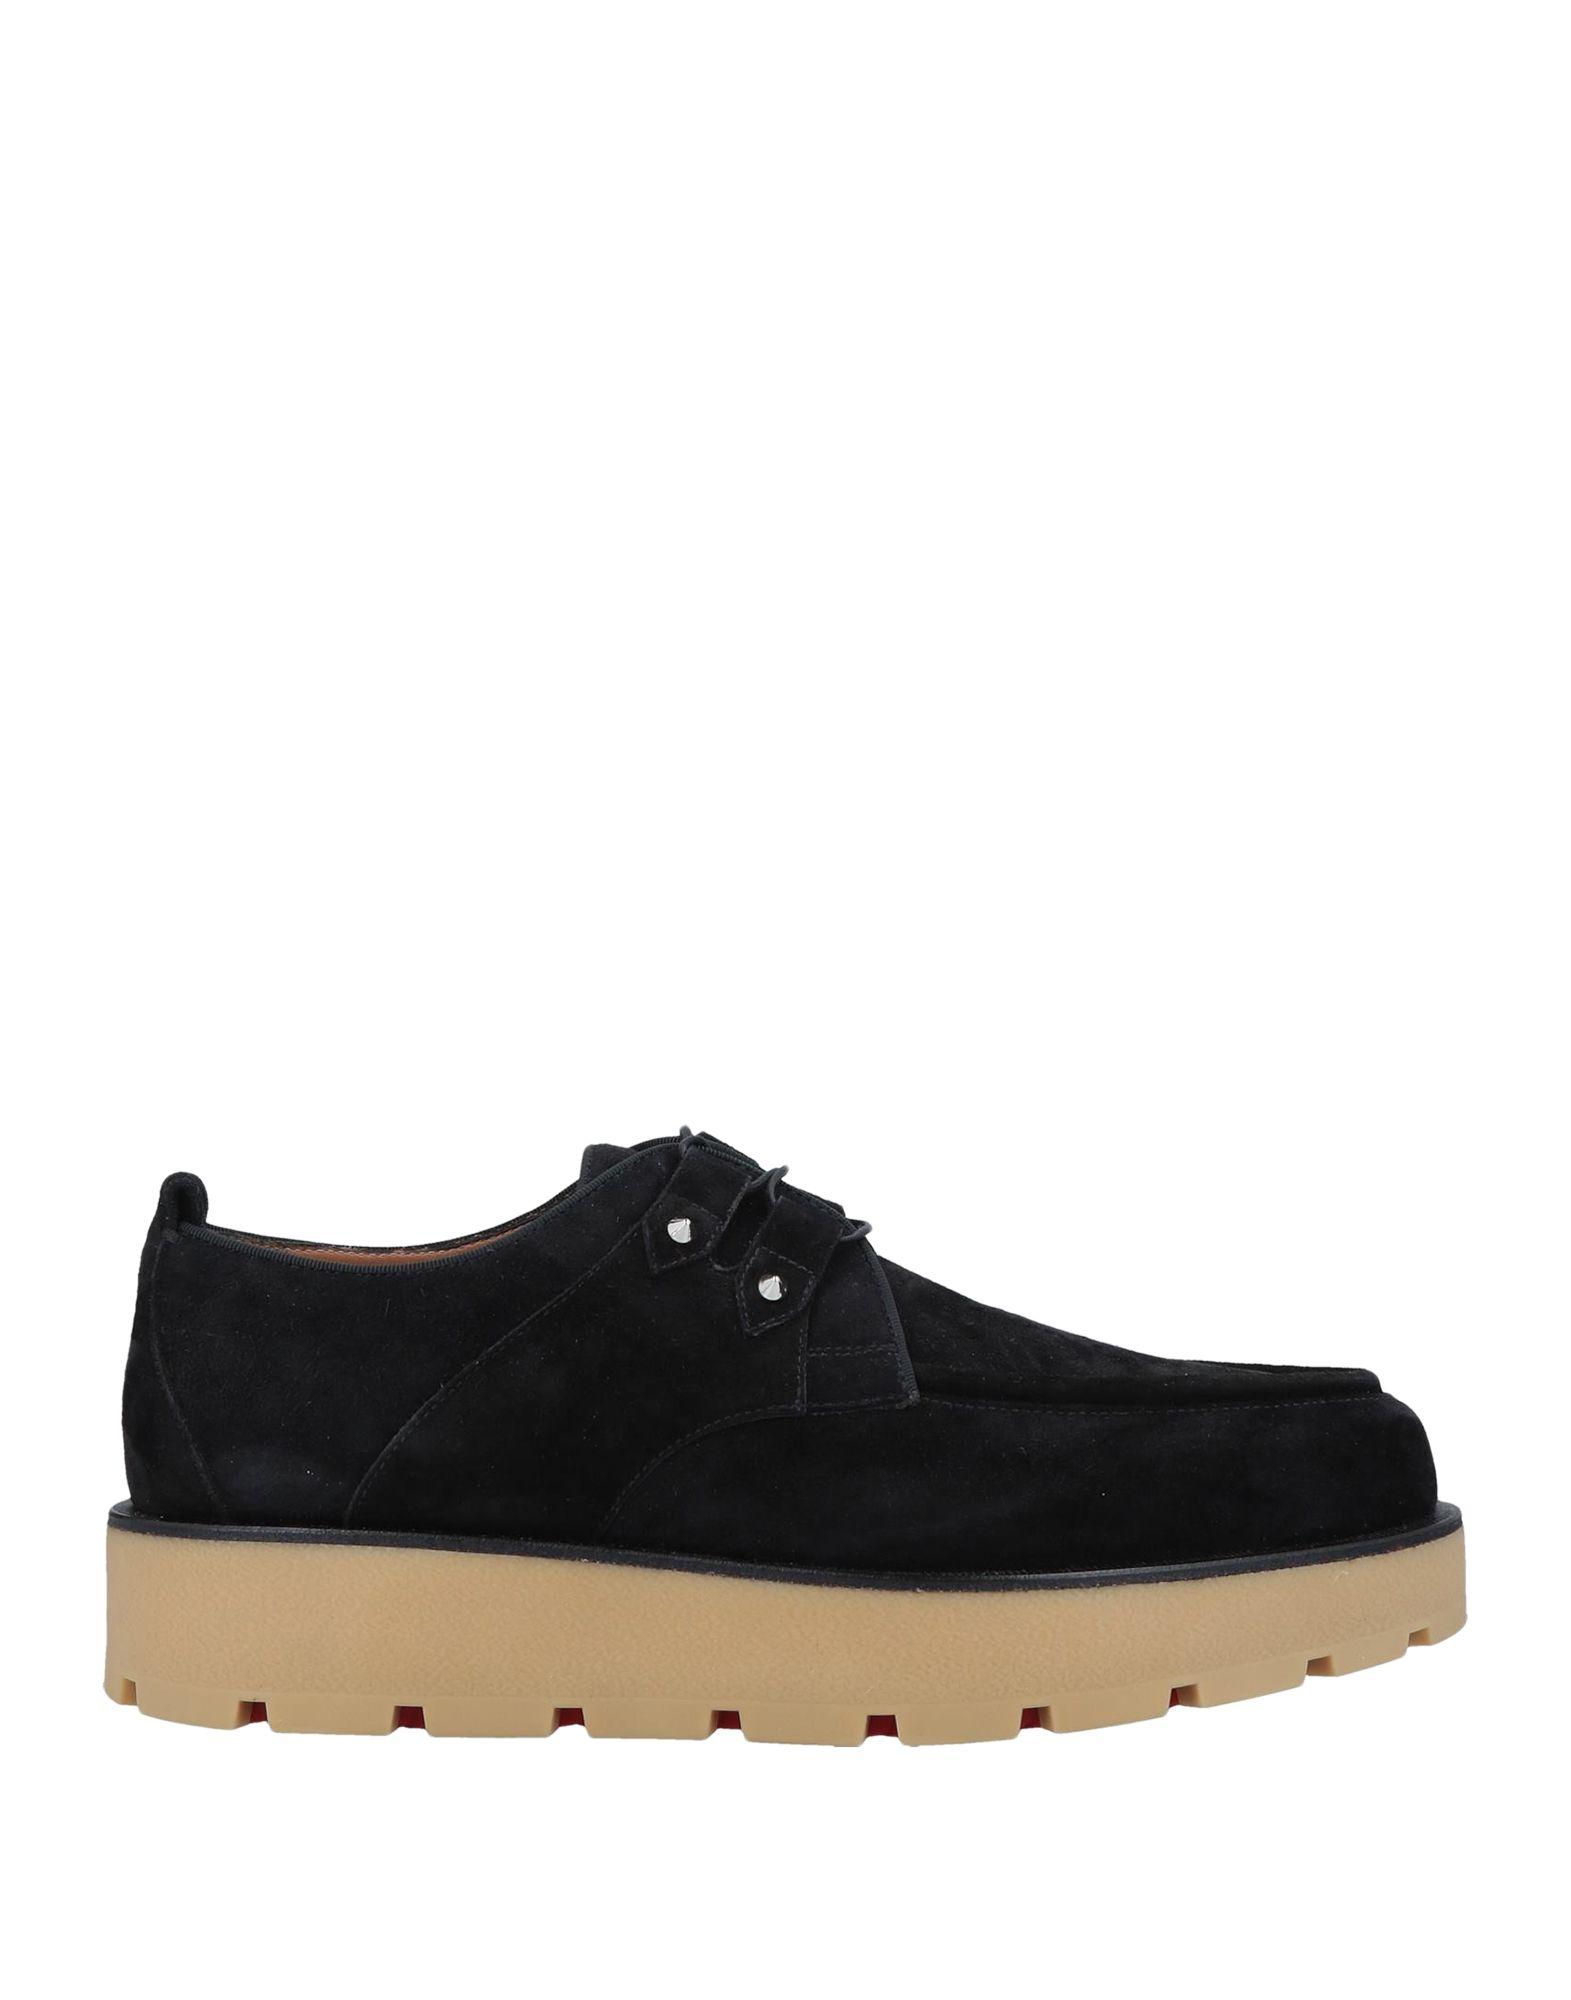 CHRISTIAN LOUBOUTIN Обувь на шнурках цены онлайн